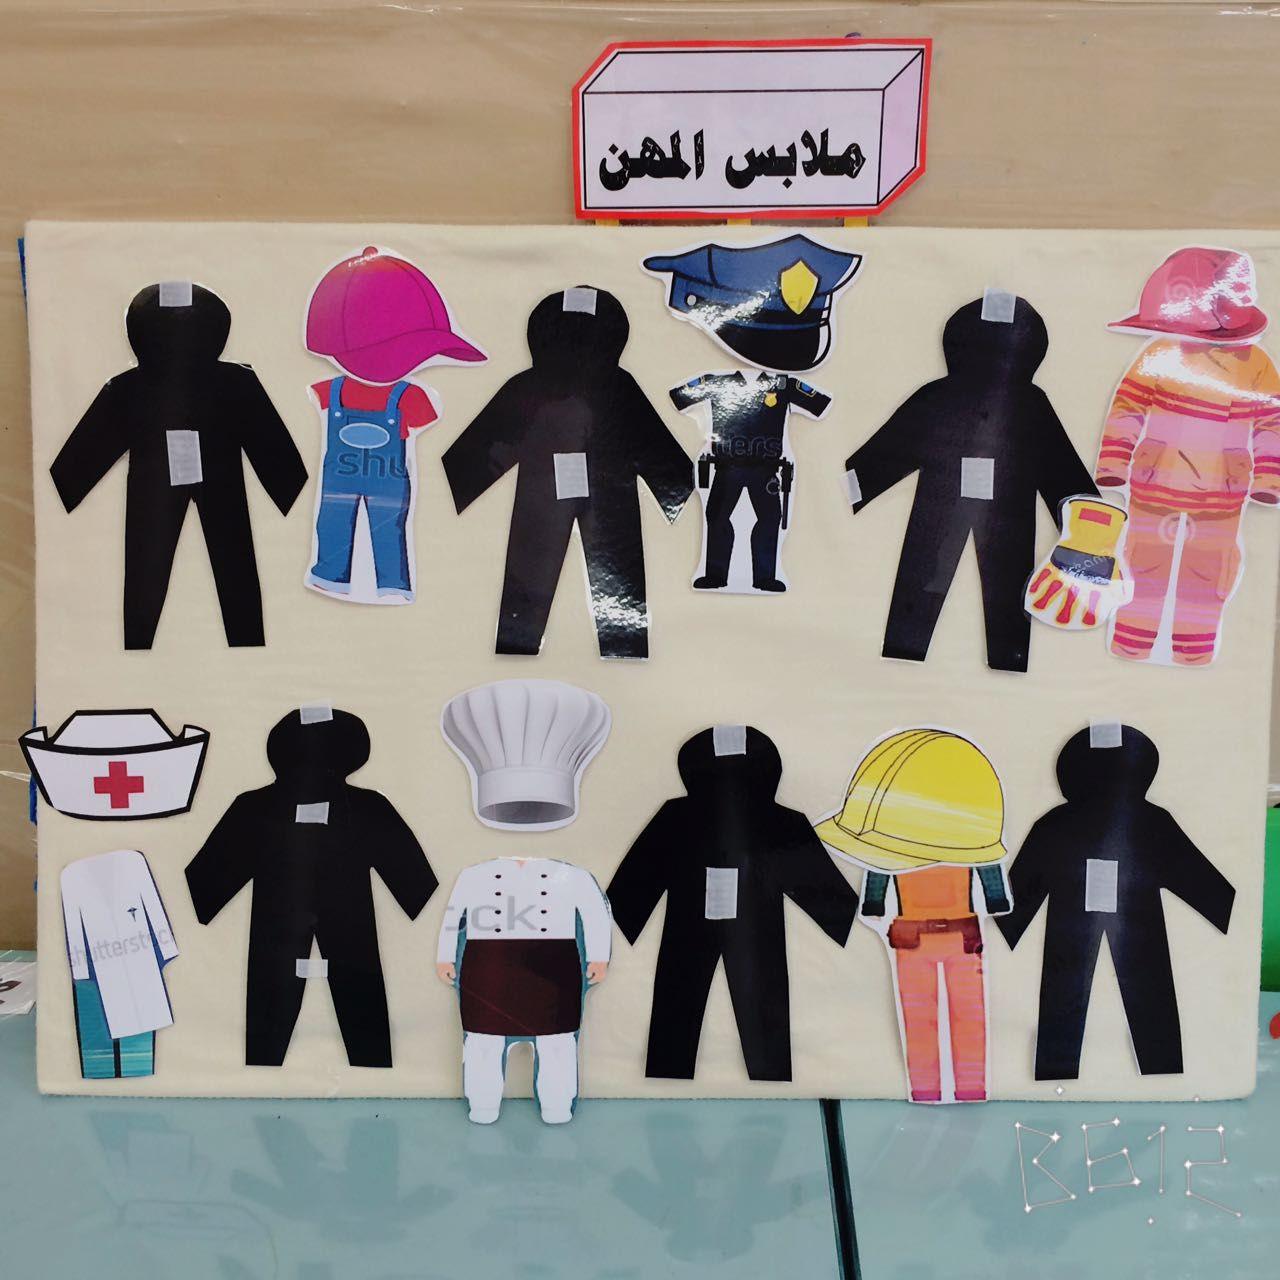 حلقة ملابس المهن Diy Educational Toys For Toddlers Arabic Alphabet For Kids Educational Toys For Toddlers